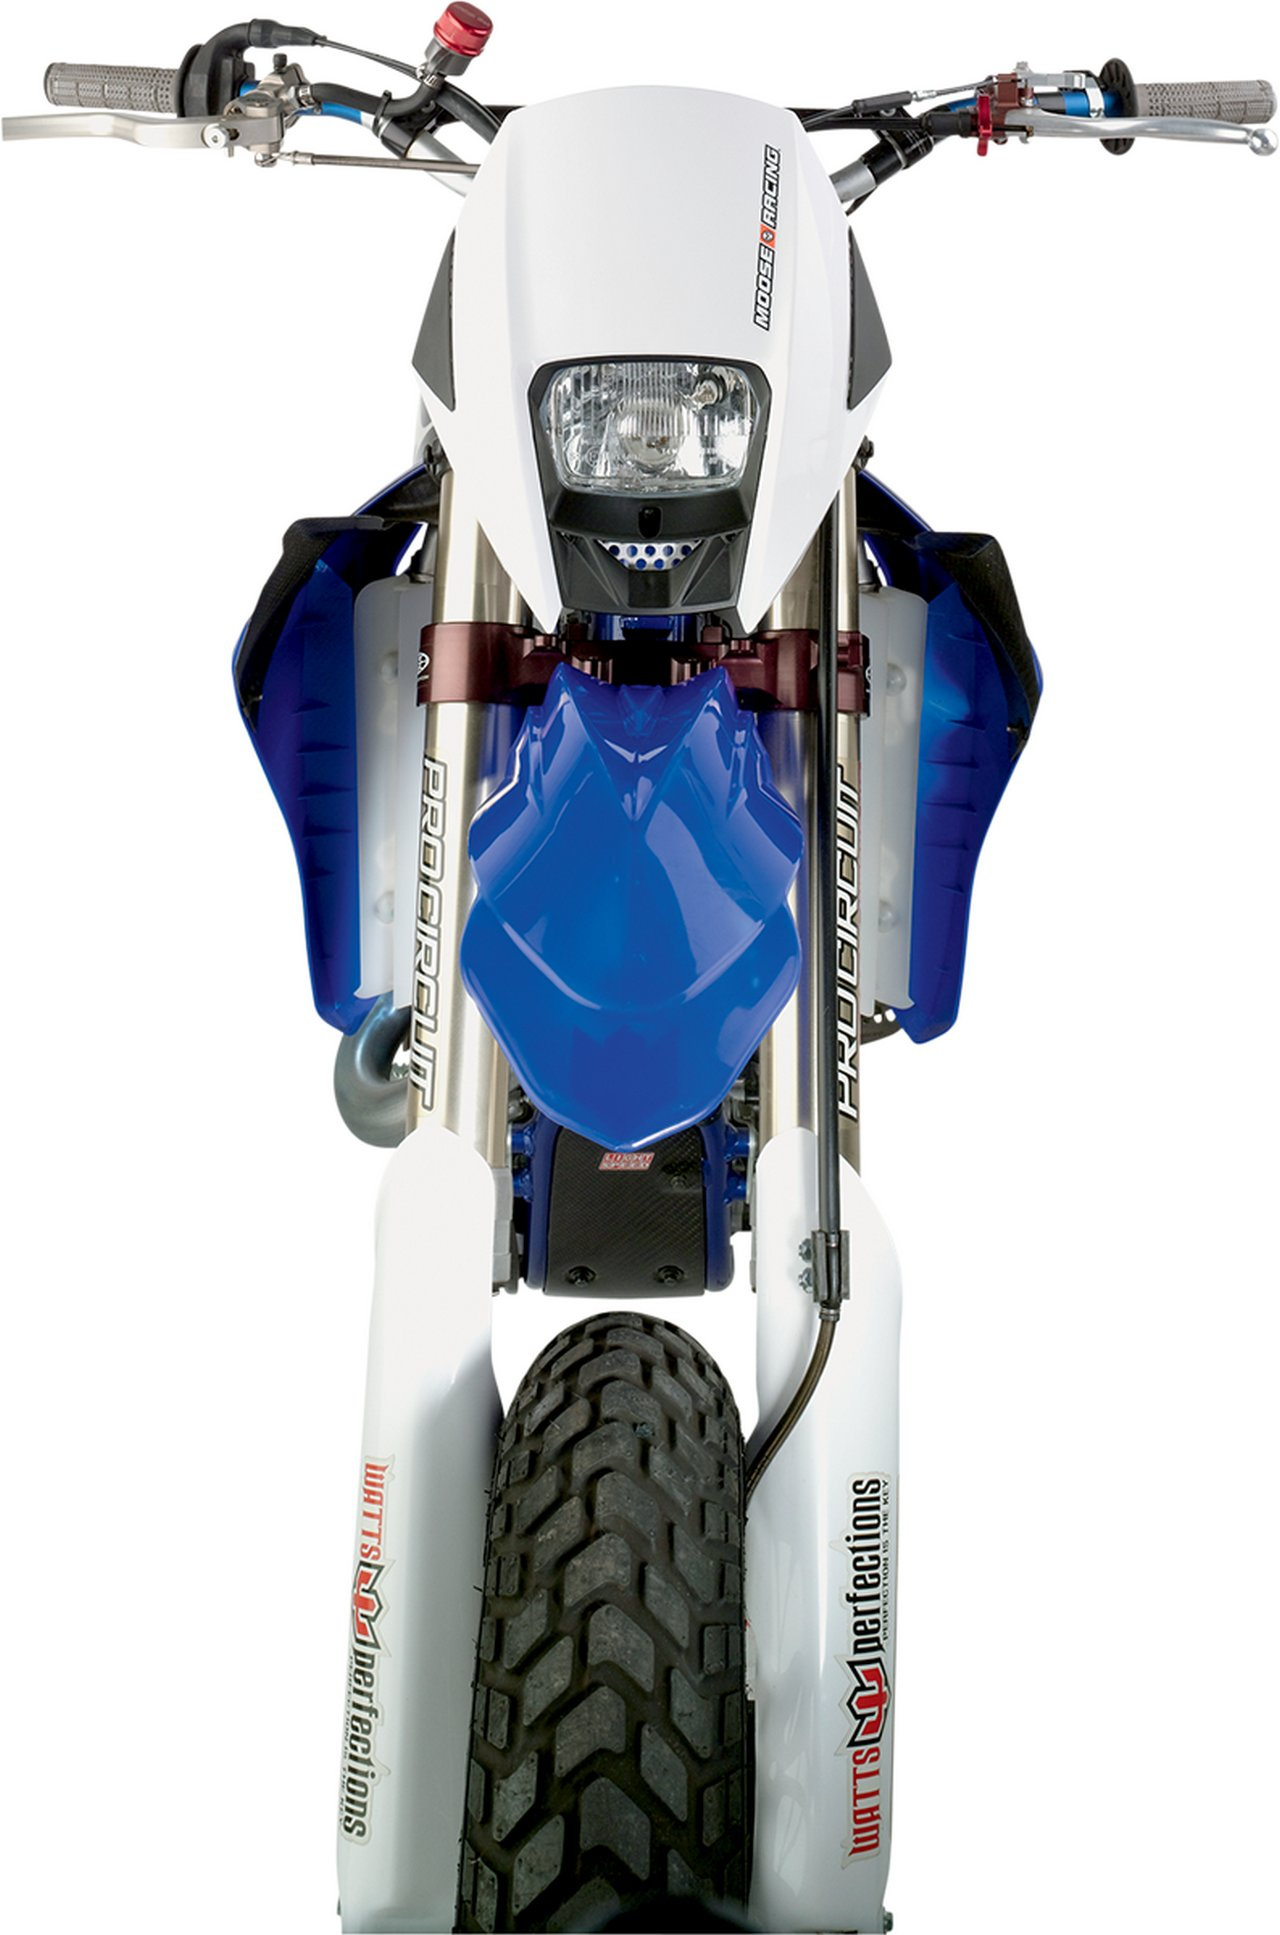 【MOOSE RACING】ROAD WARRIOR 頭燈 [2001-0480] - 「Webike-摩托百貨」